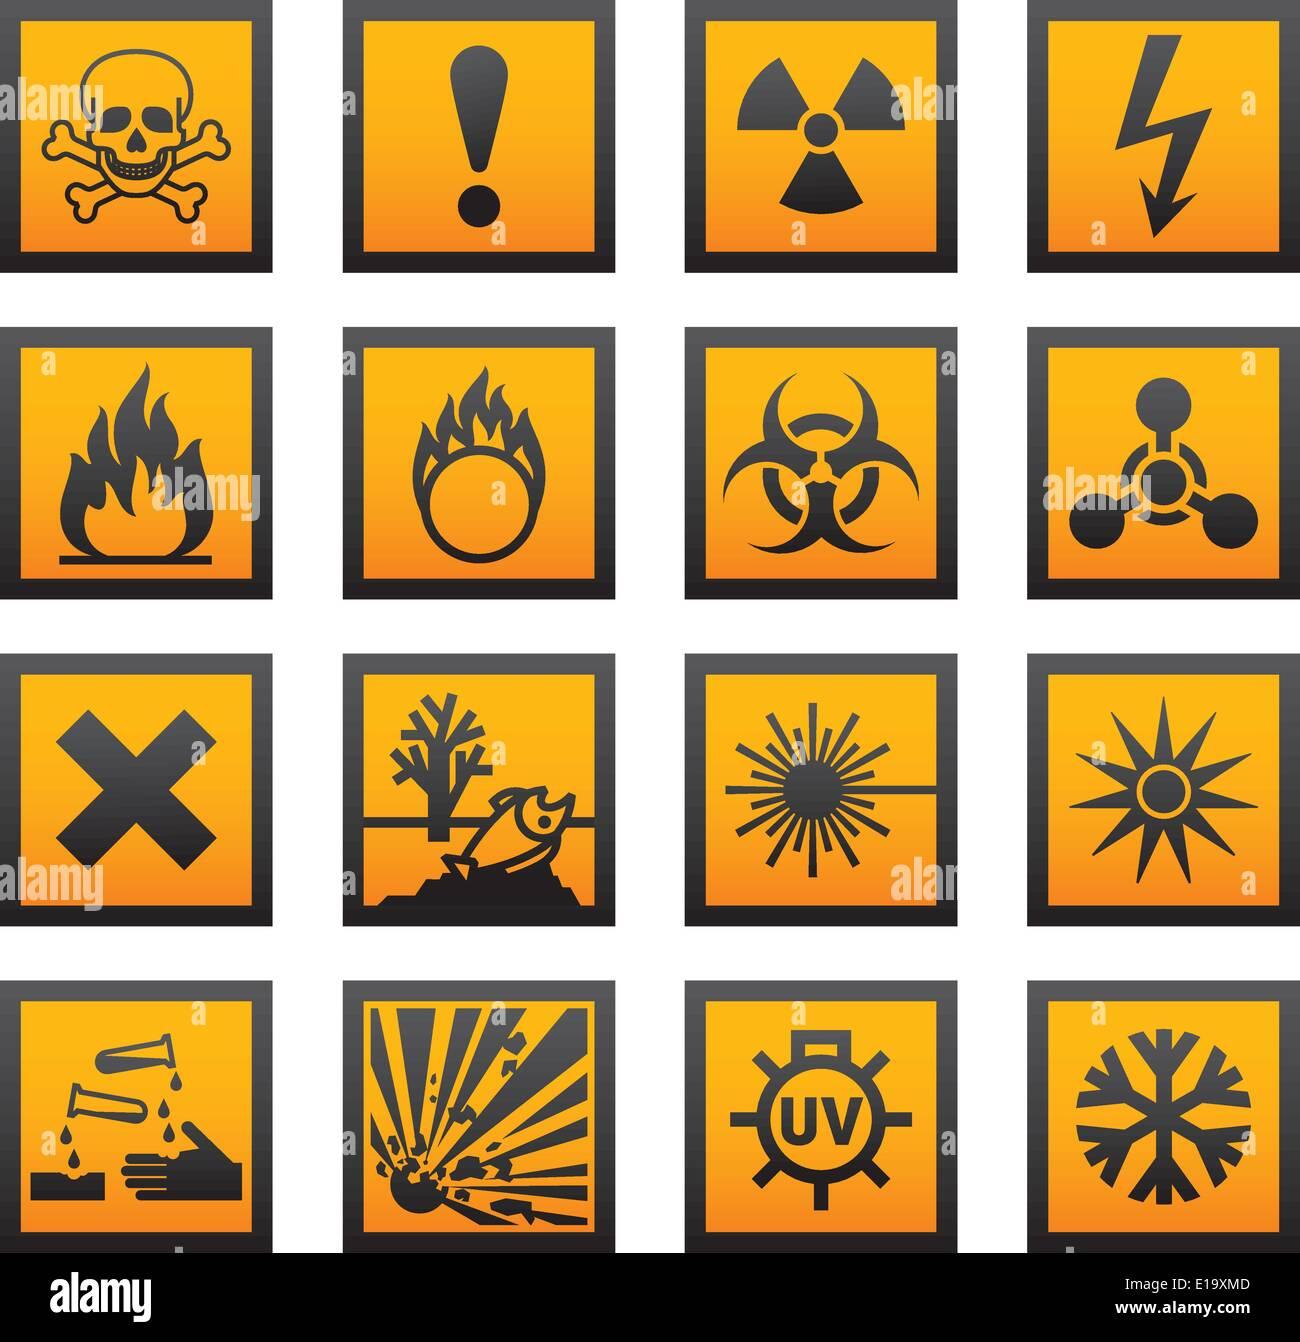 Biological Hazard Symbols Stock Photos Amp Biological Hazard